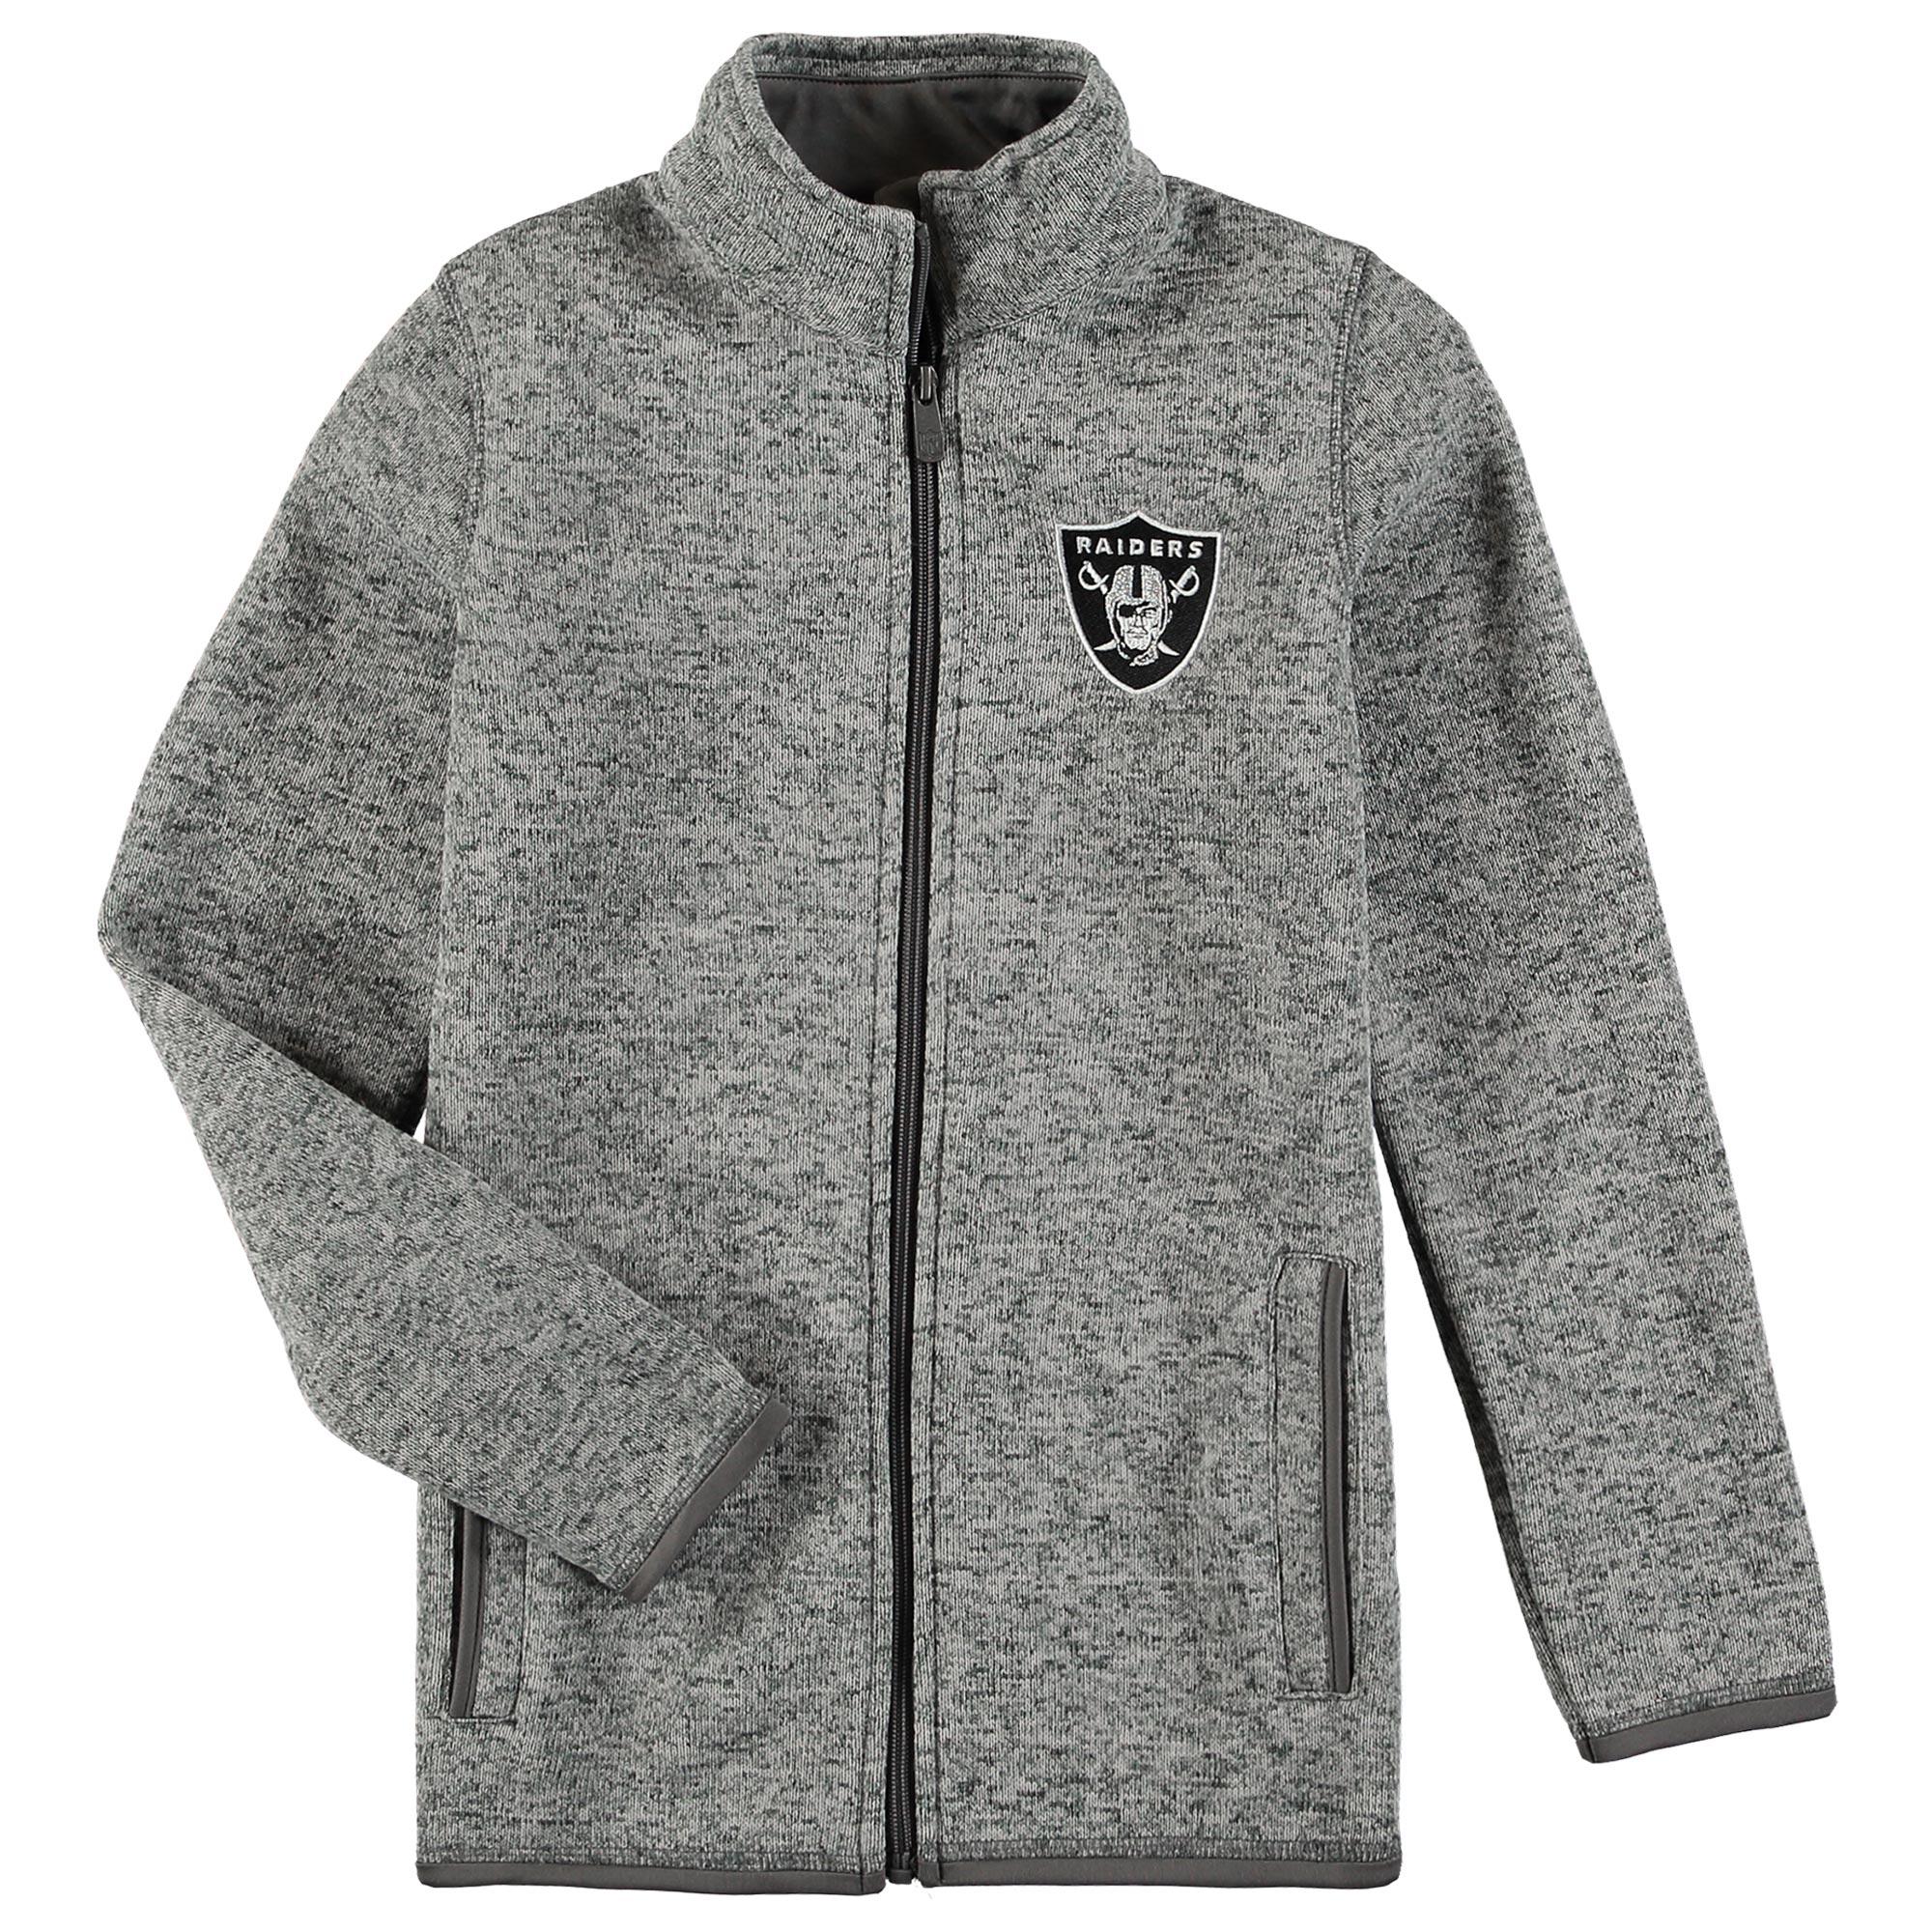 Oakland Raiders Youth Lima Full-Zip Jacket - Heathered Gray